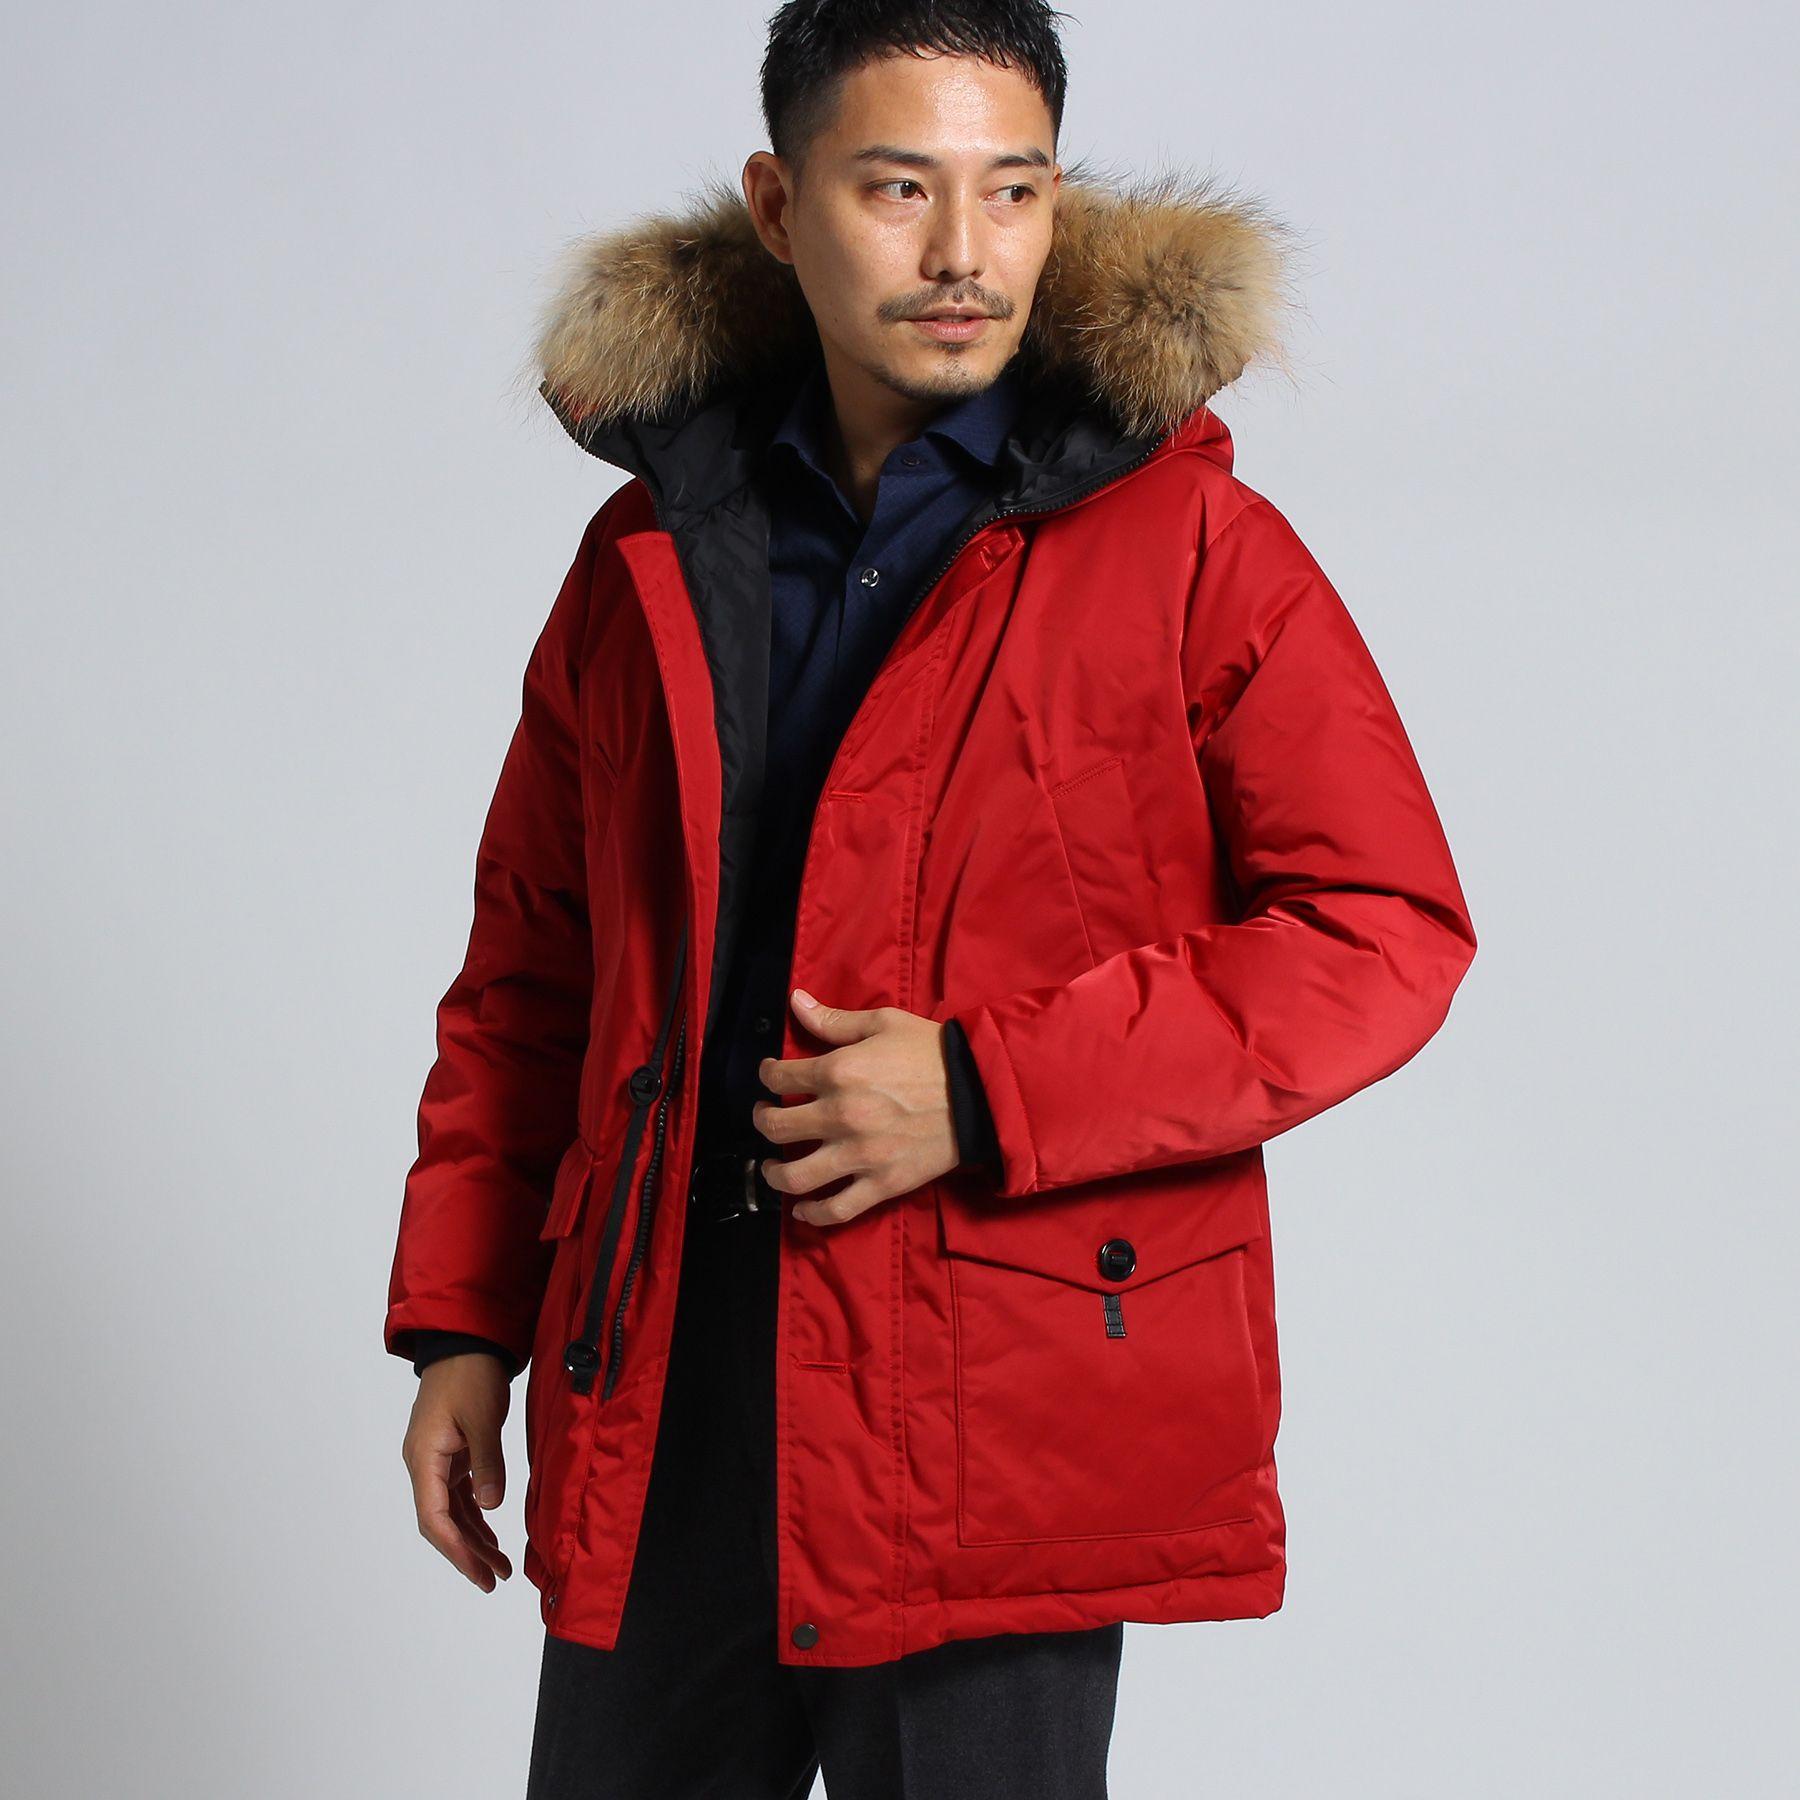 TAKEO KIKUCHI(タケオキクチ:メンズ)/◆ダウンジャケット[ メンズ アウター ダウン ]